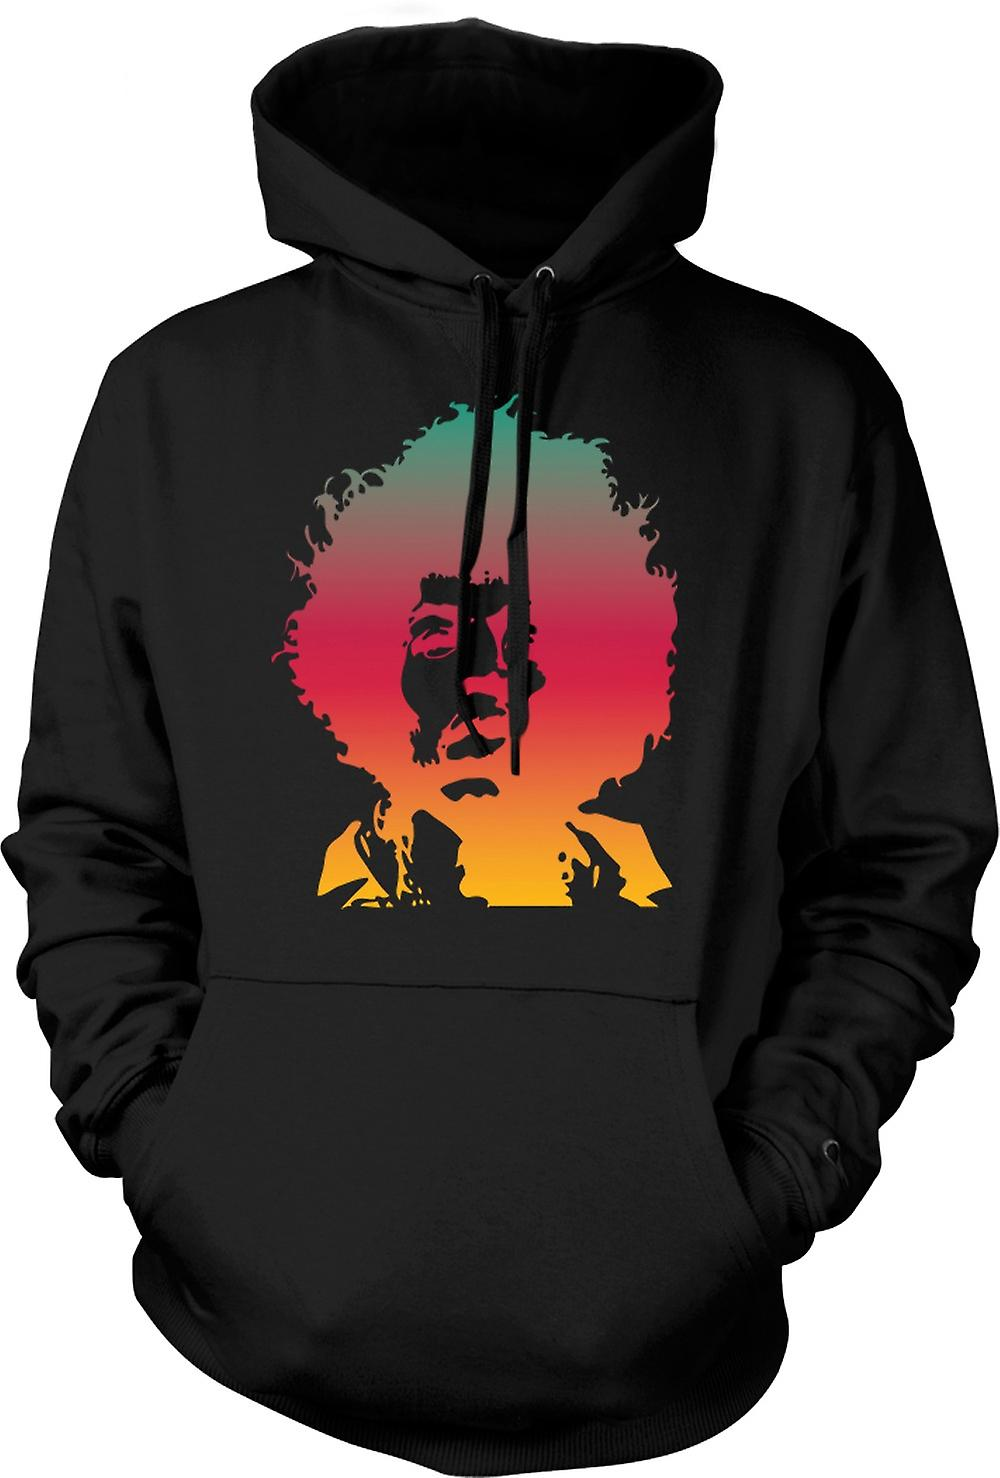 Mens Hoodie - Jimi Hendrix Portrait Cool